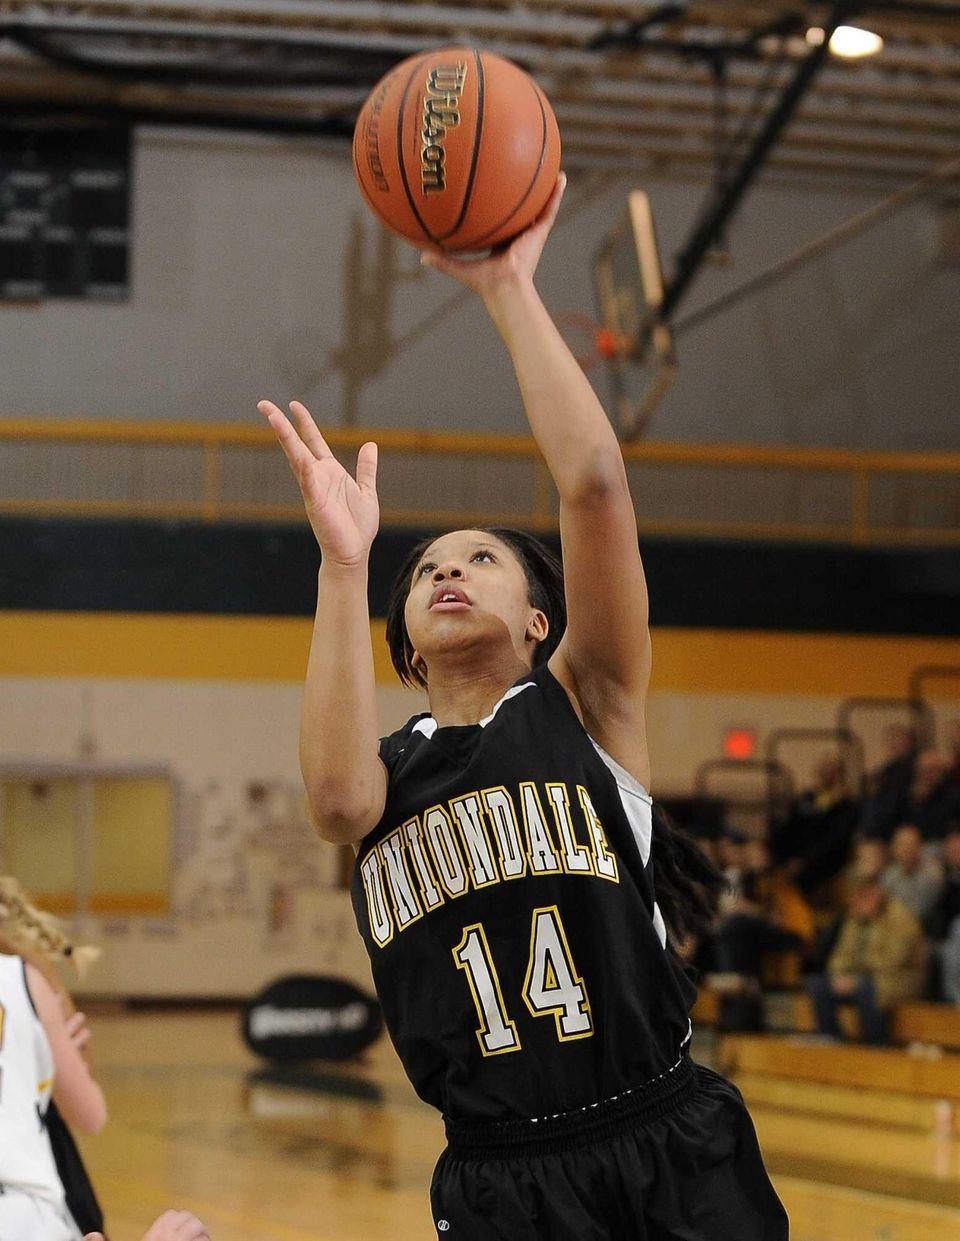 Uniondale's Jayda Hyatt scores against Massapequa in the